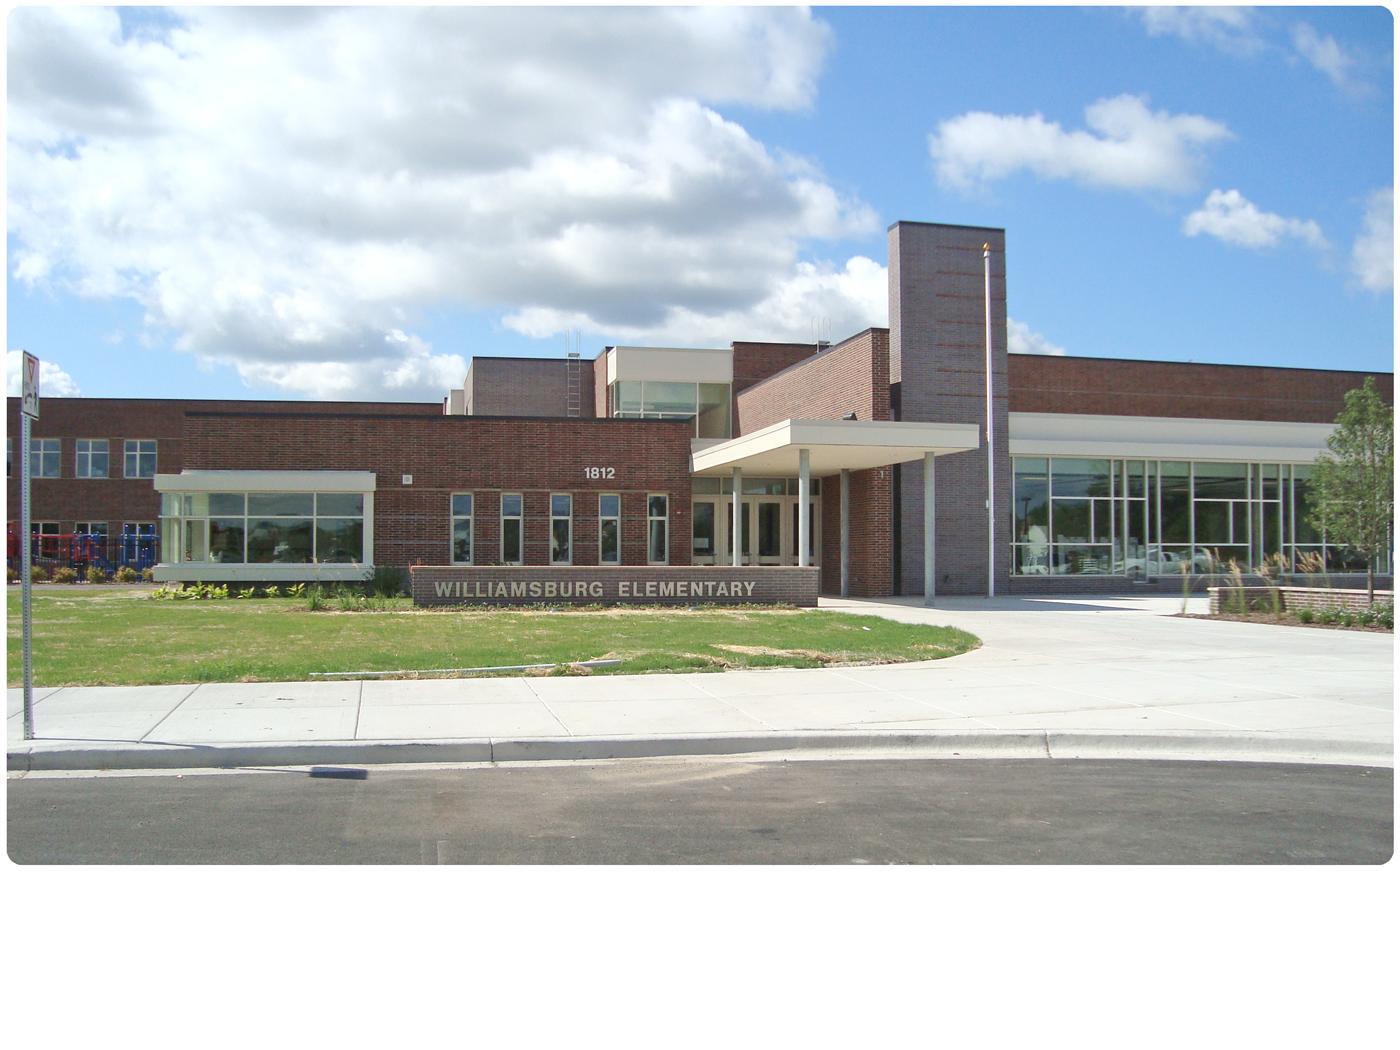 Williamsburg Elementary School